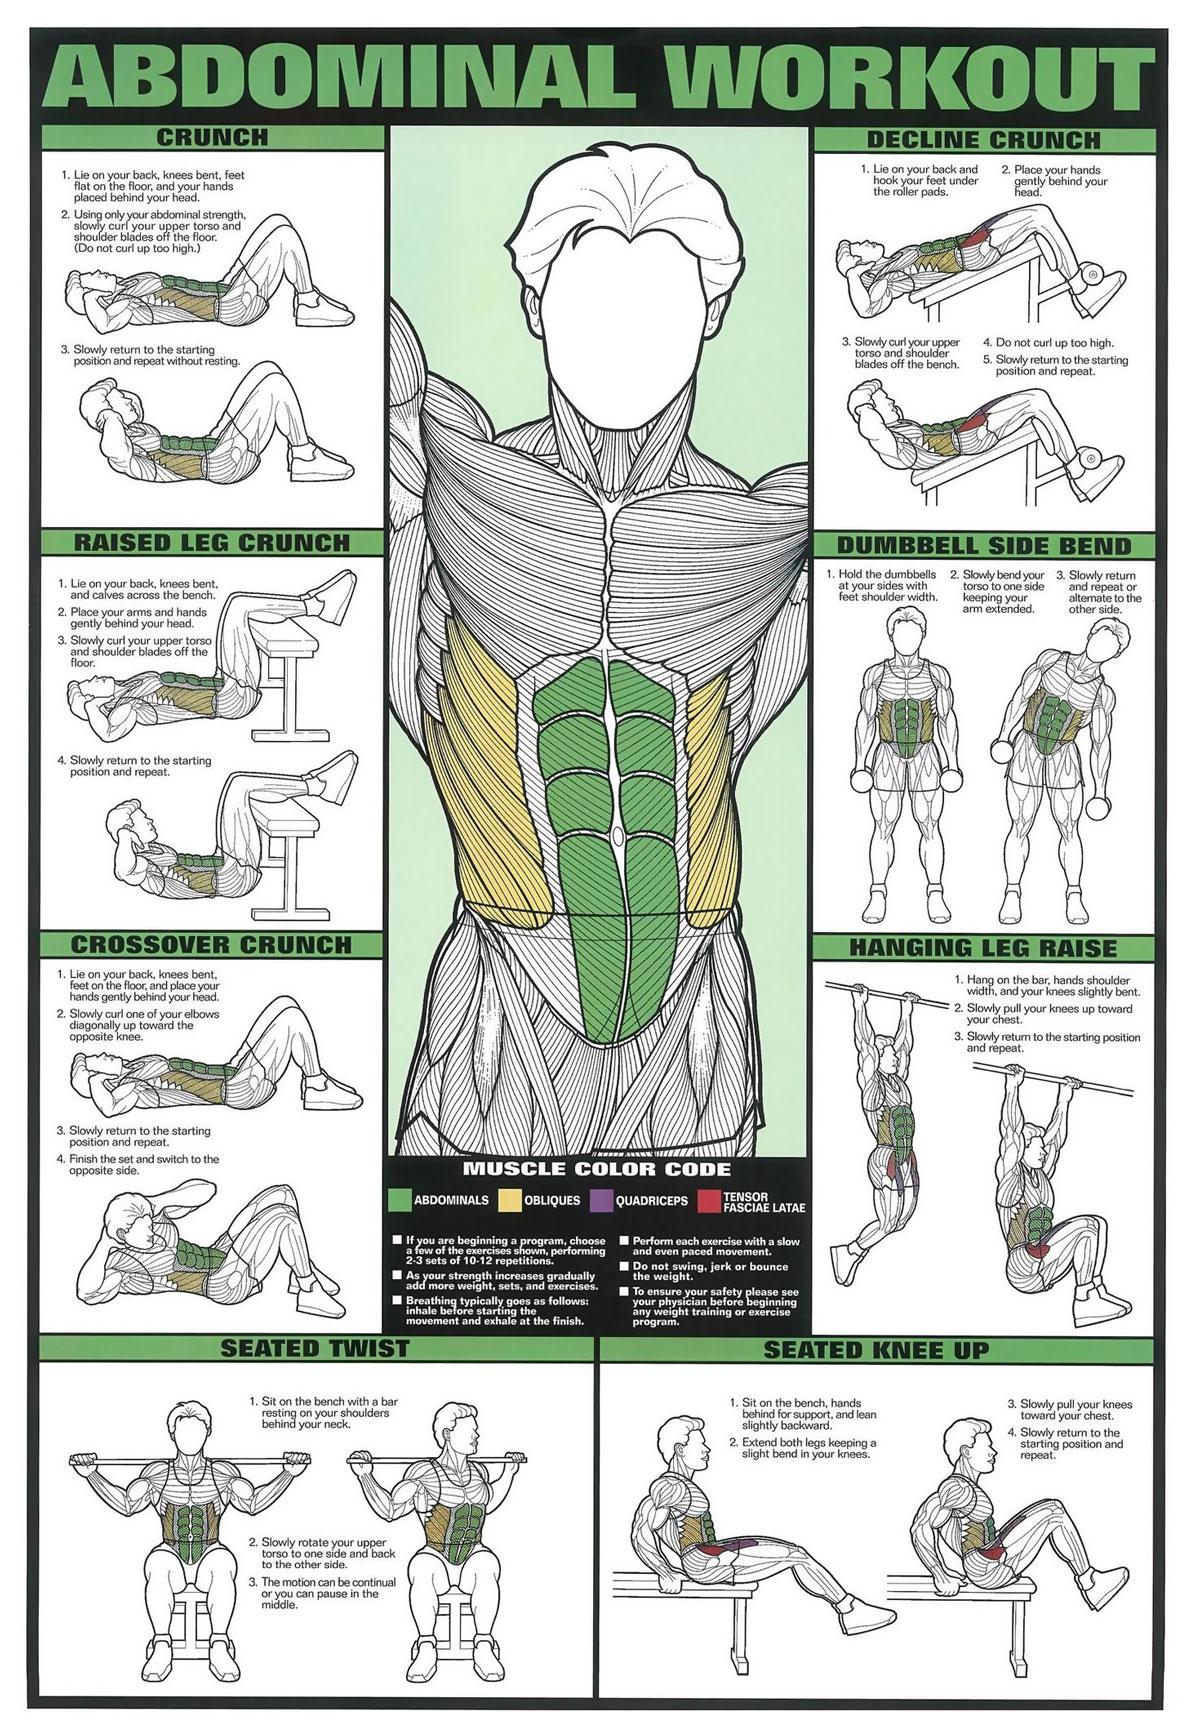 Abdominal Workout Chart